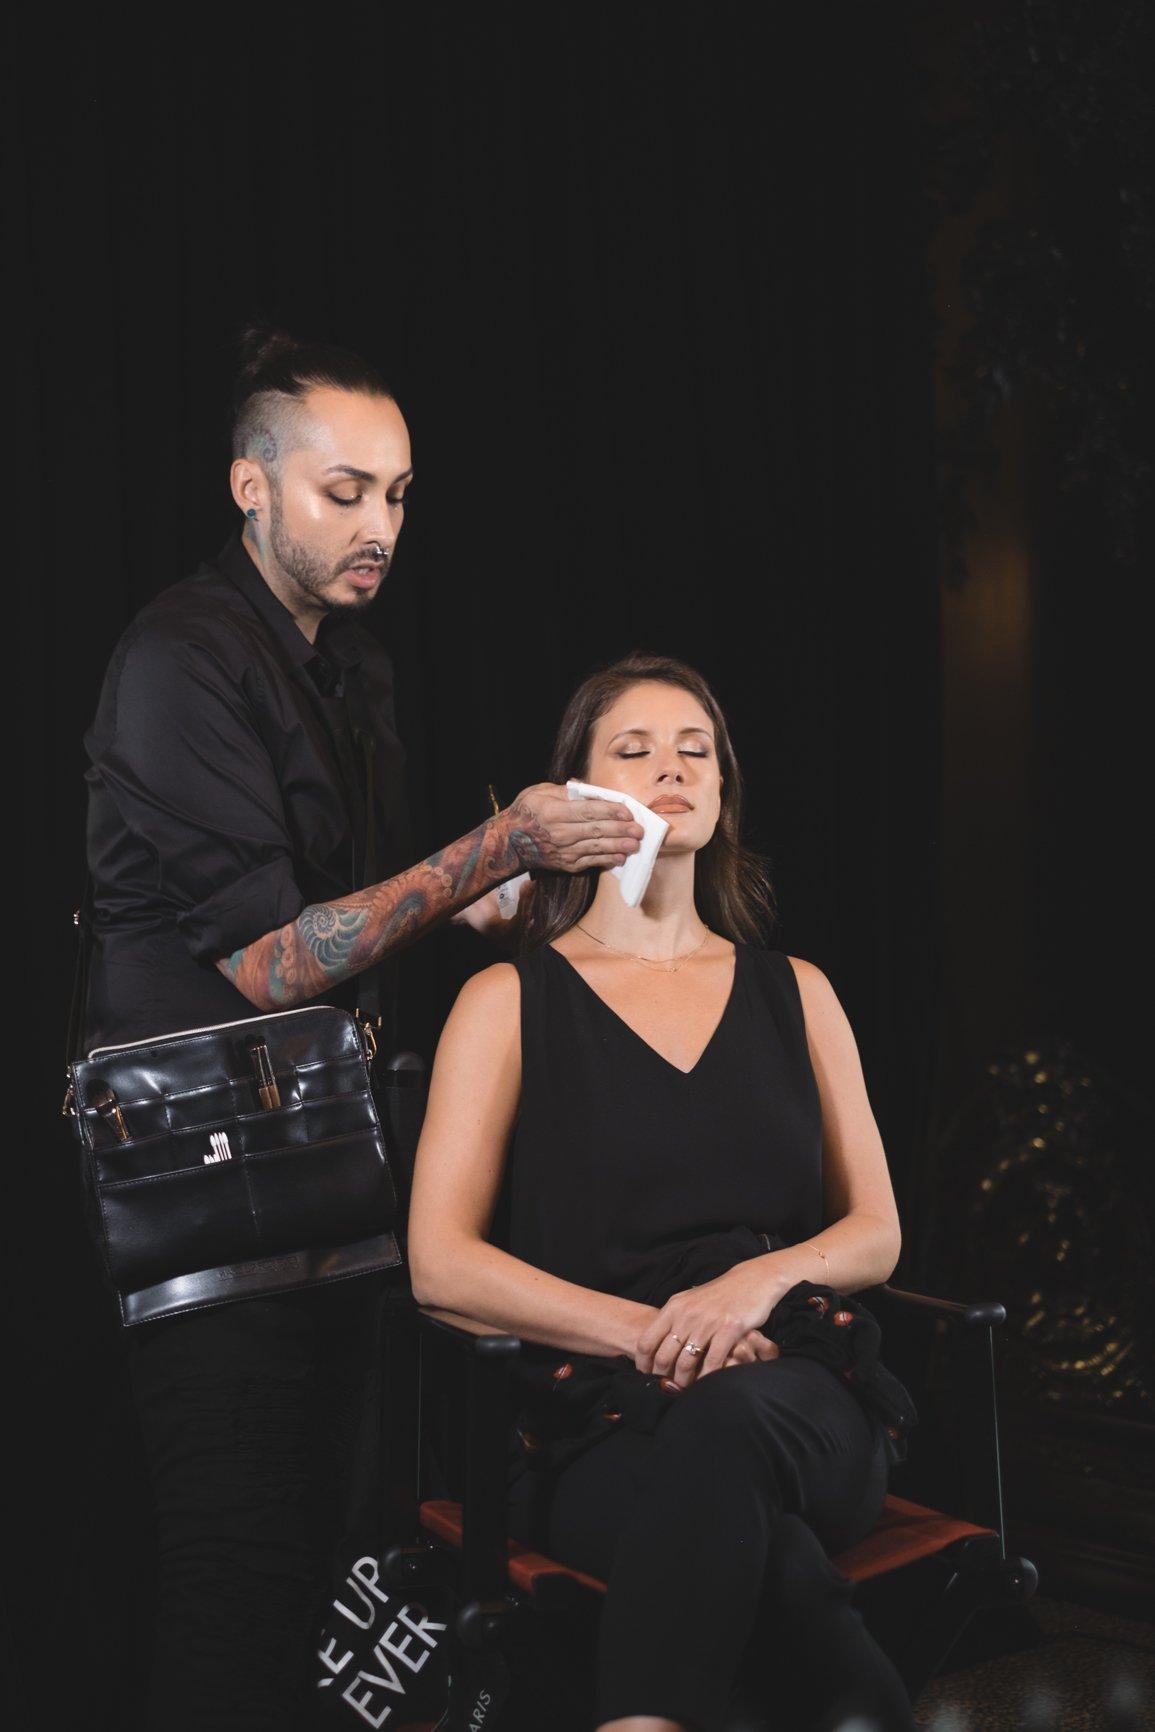 sunkissedblush-makeupforever-masterclass-houston-hotel-zaza-matte-velvet-skin-foundation (20 of 20)